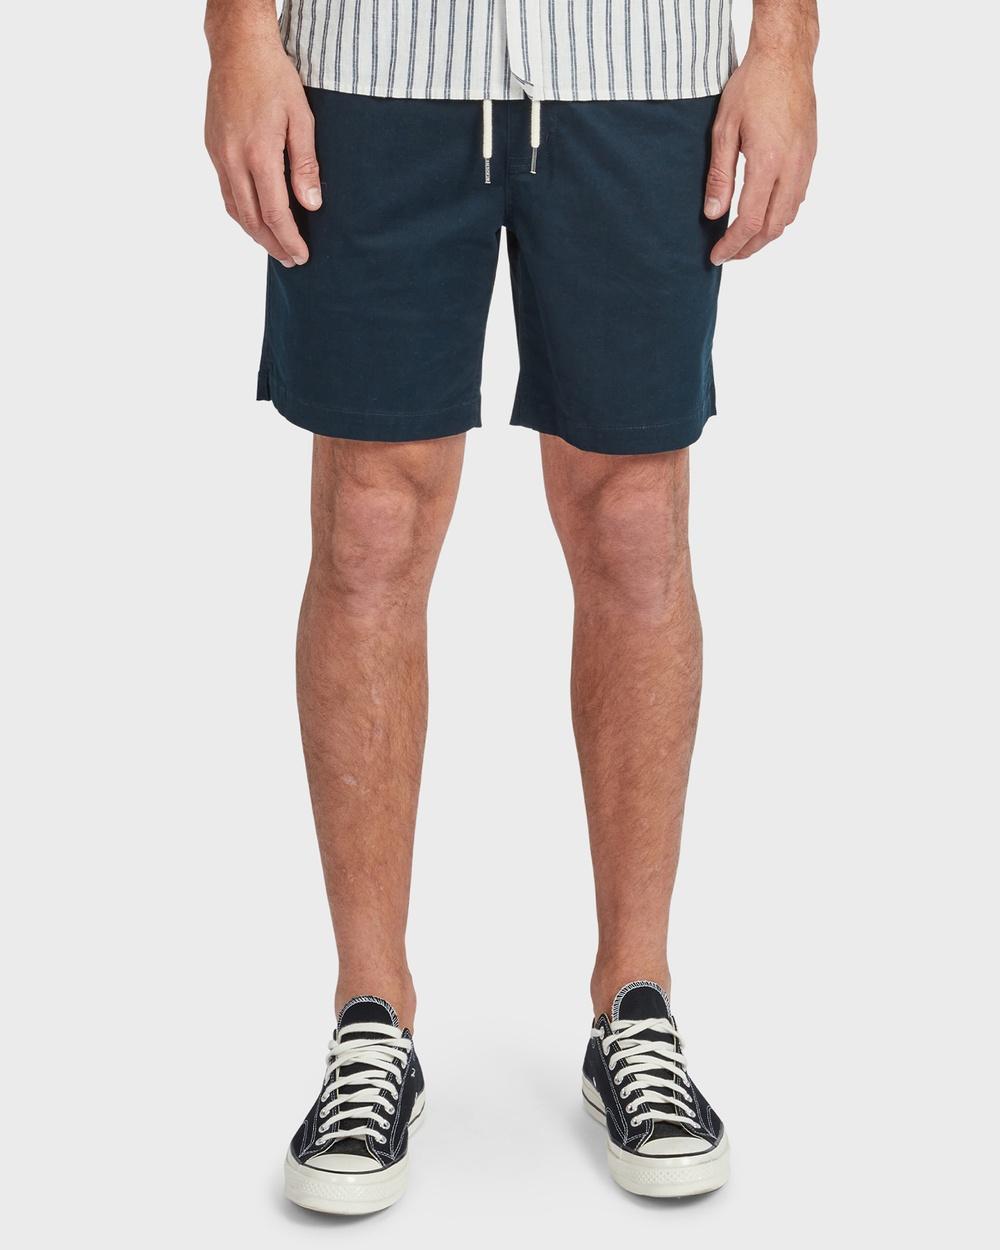 Academy Brand Volley Short Shorts Navy